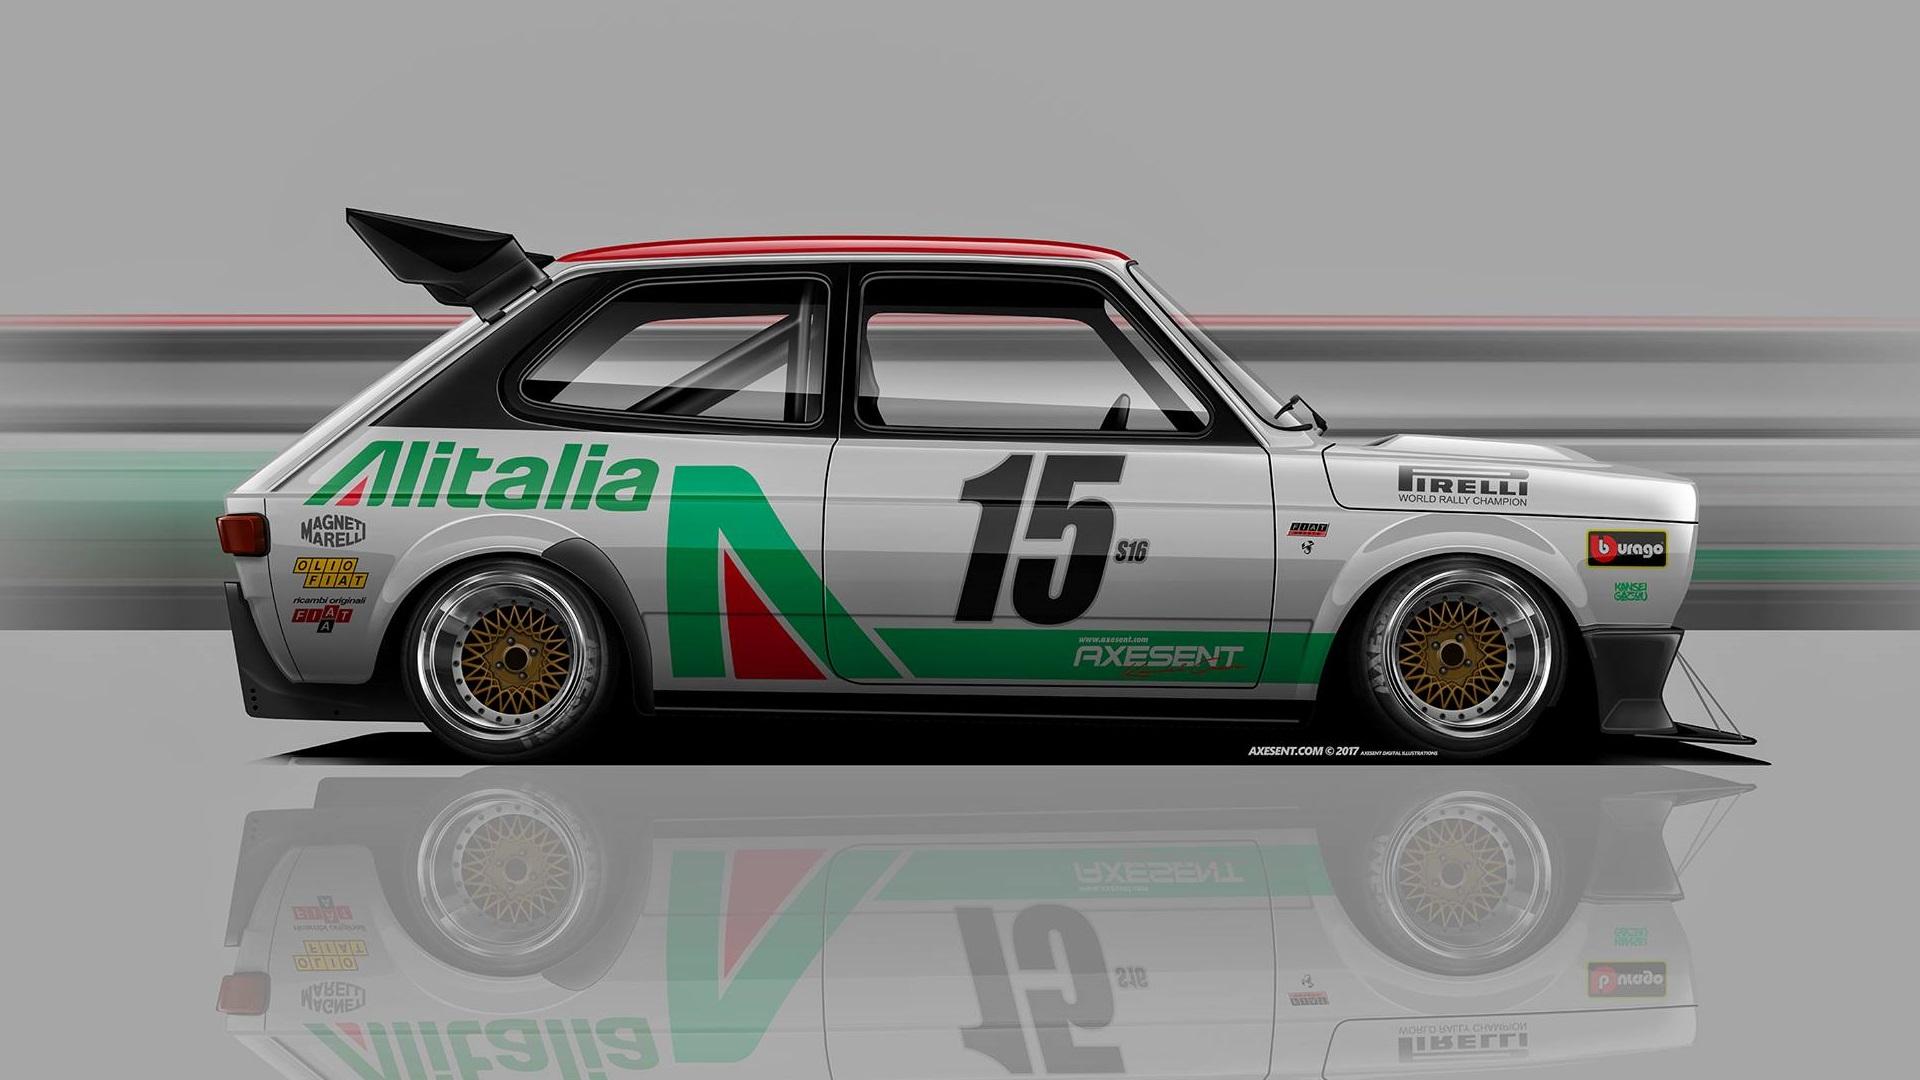 Wallpaper Axesent Creations Fiat 127 Render Race Cars